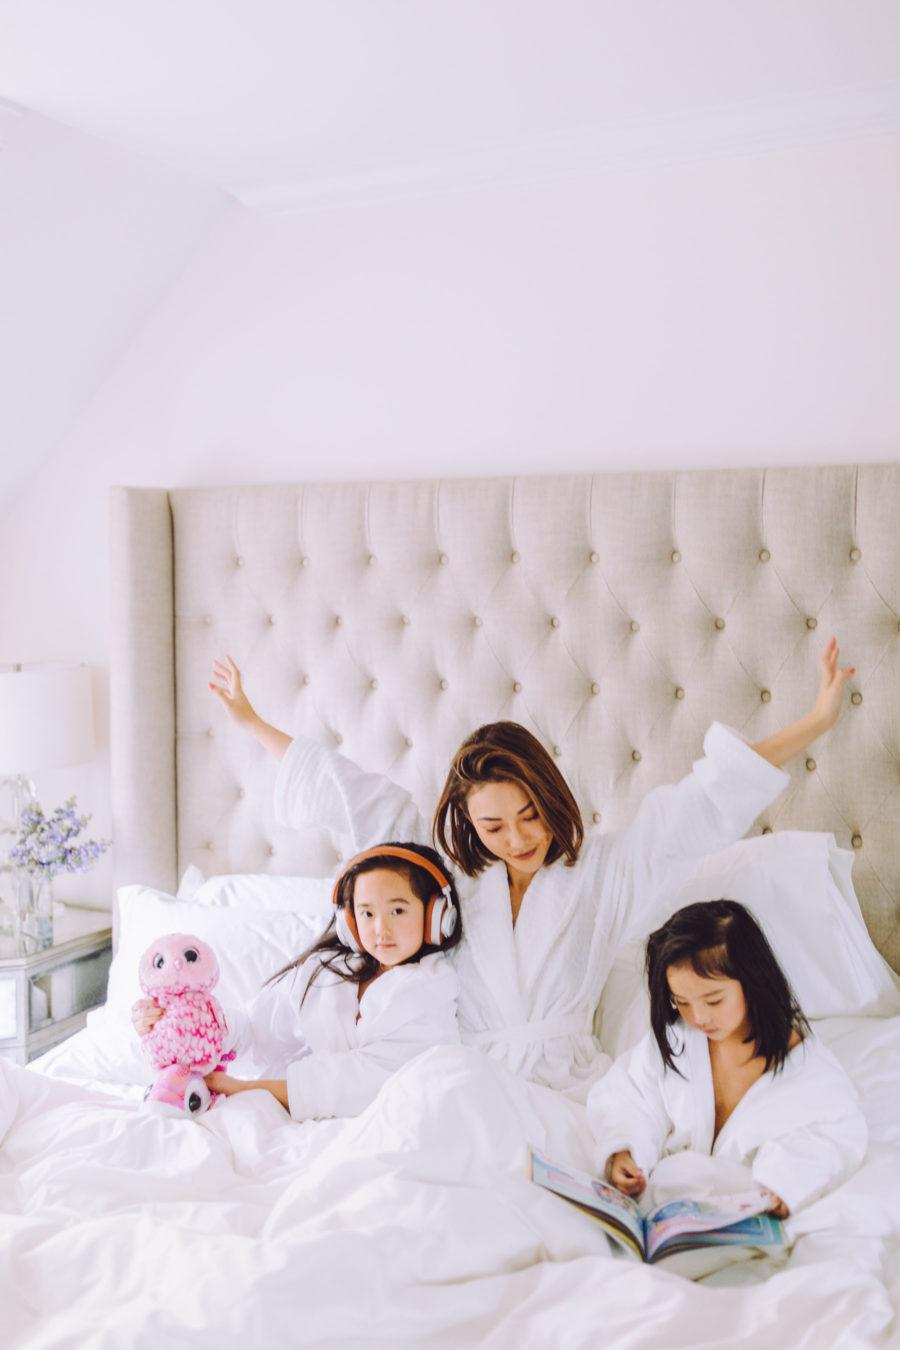 winter skincare brands for kids // Notjessfashion.com